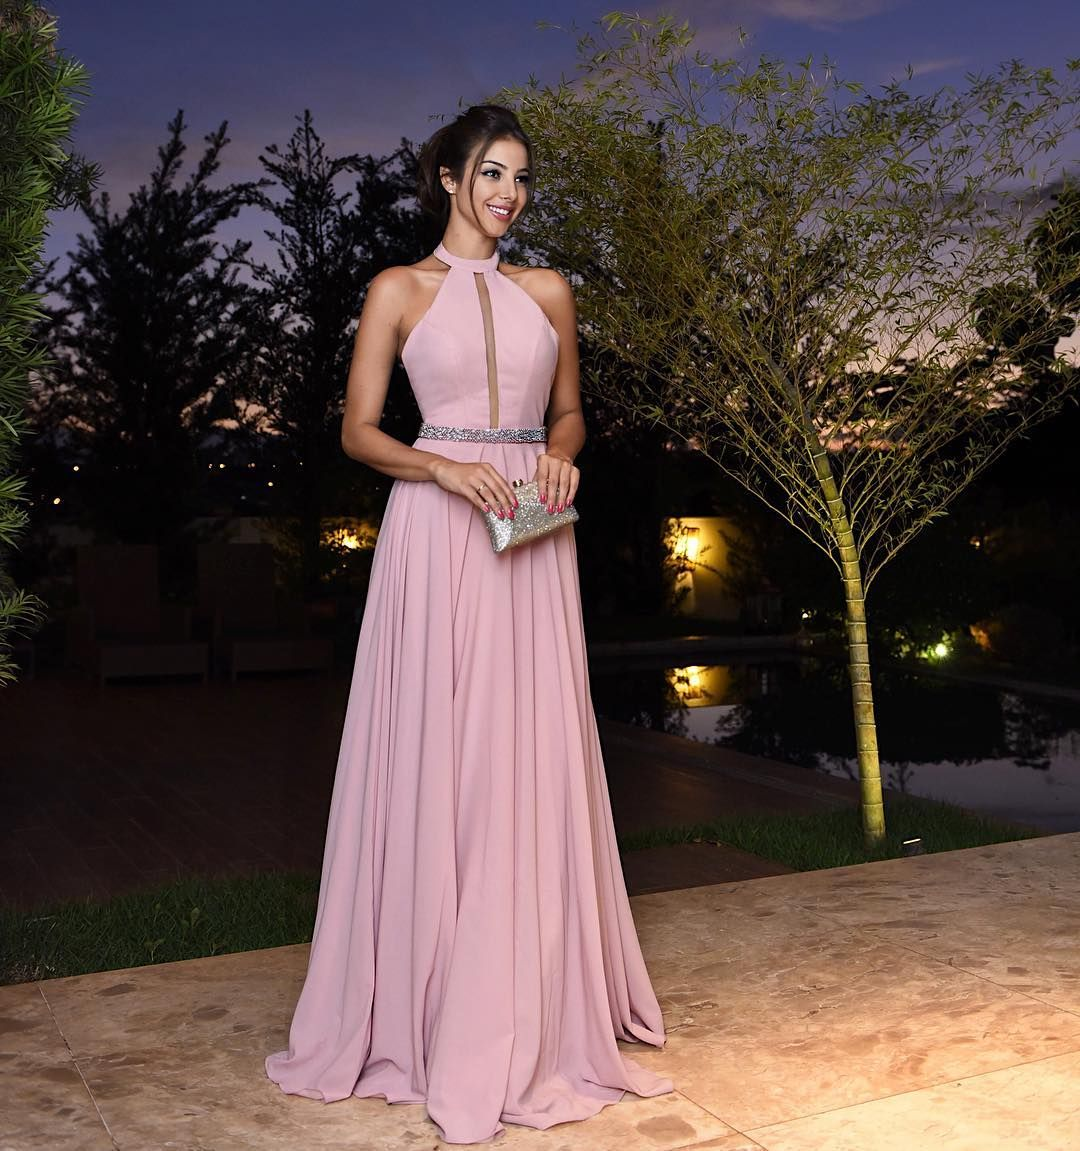 Pin de Wanda Deglane en Prom Dresses | Pinterest | Vestiditos, Baile ...